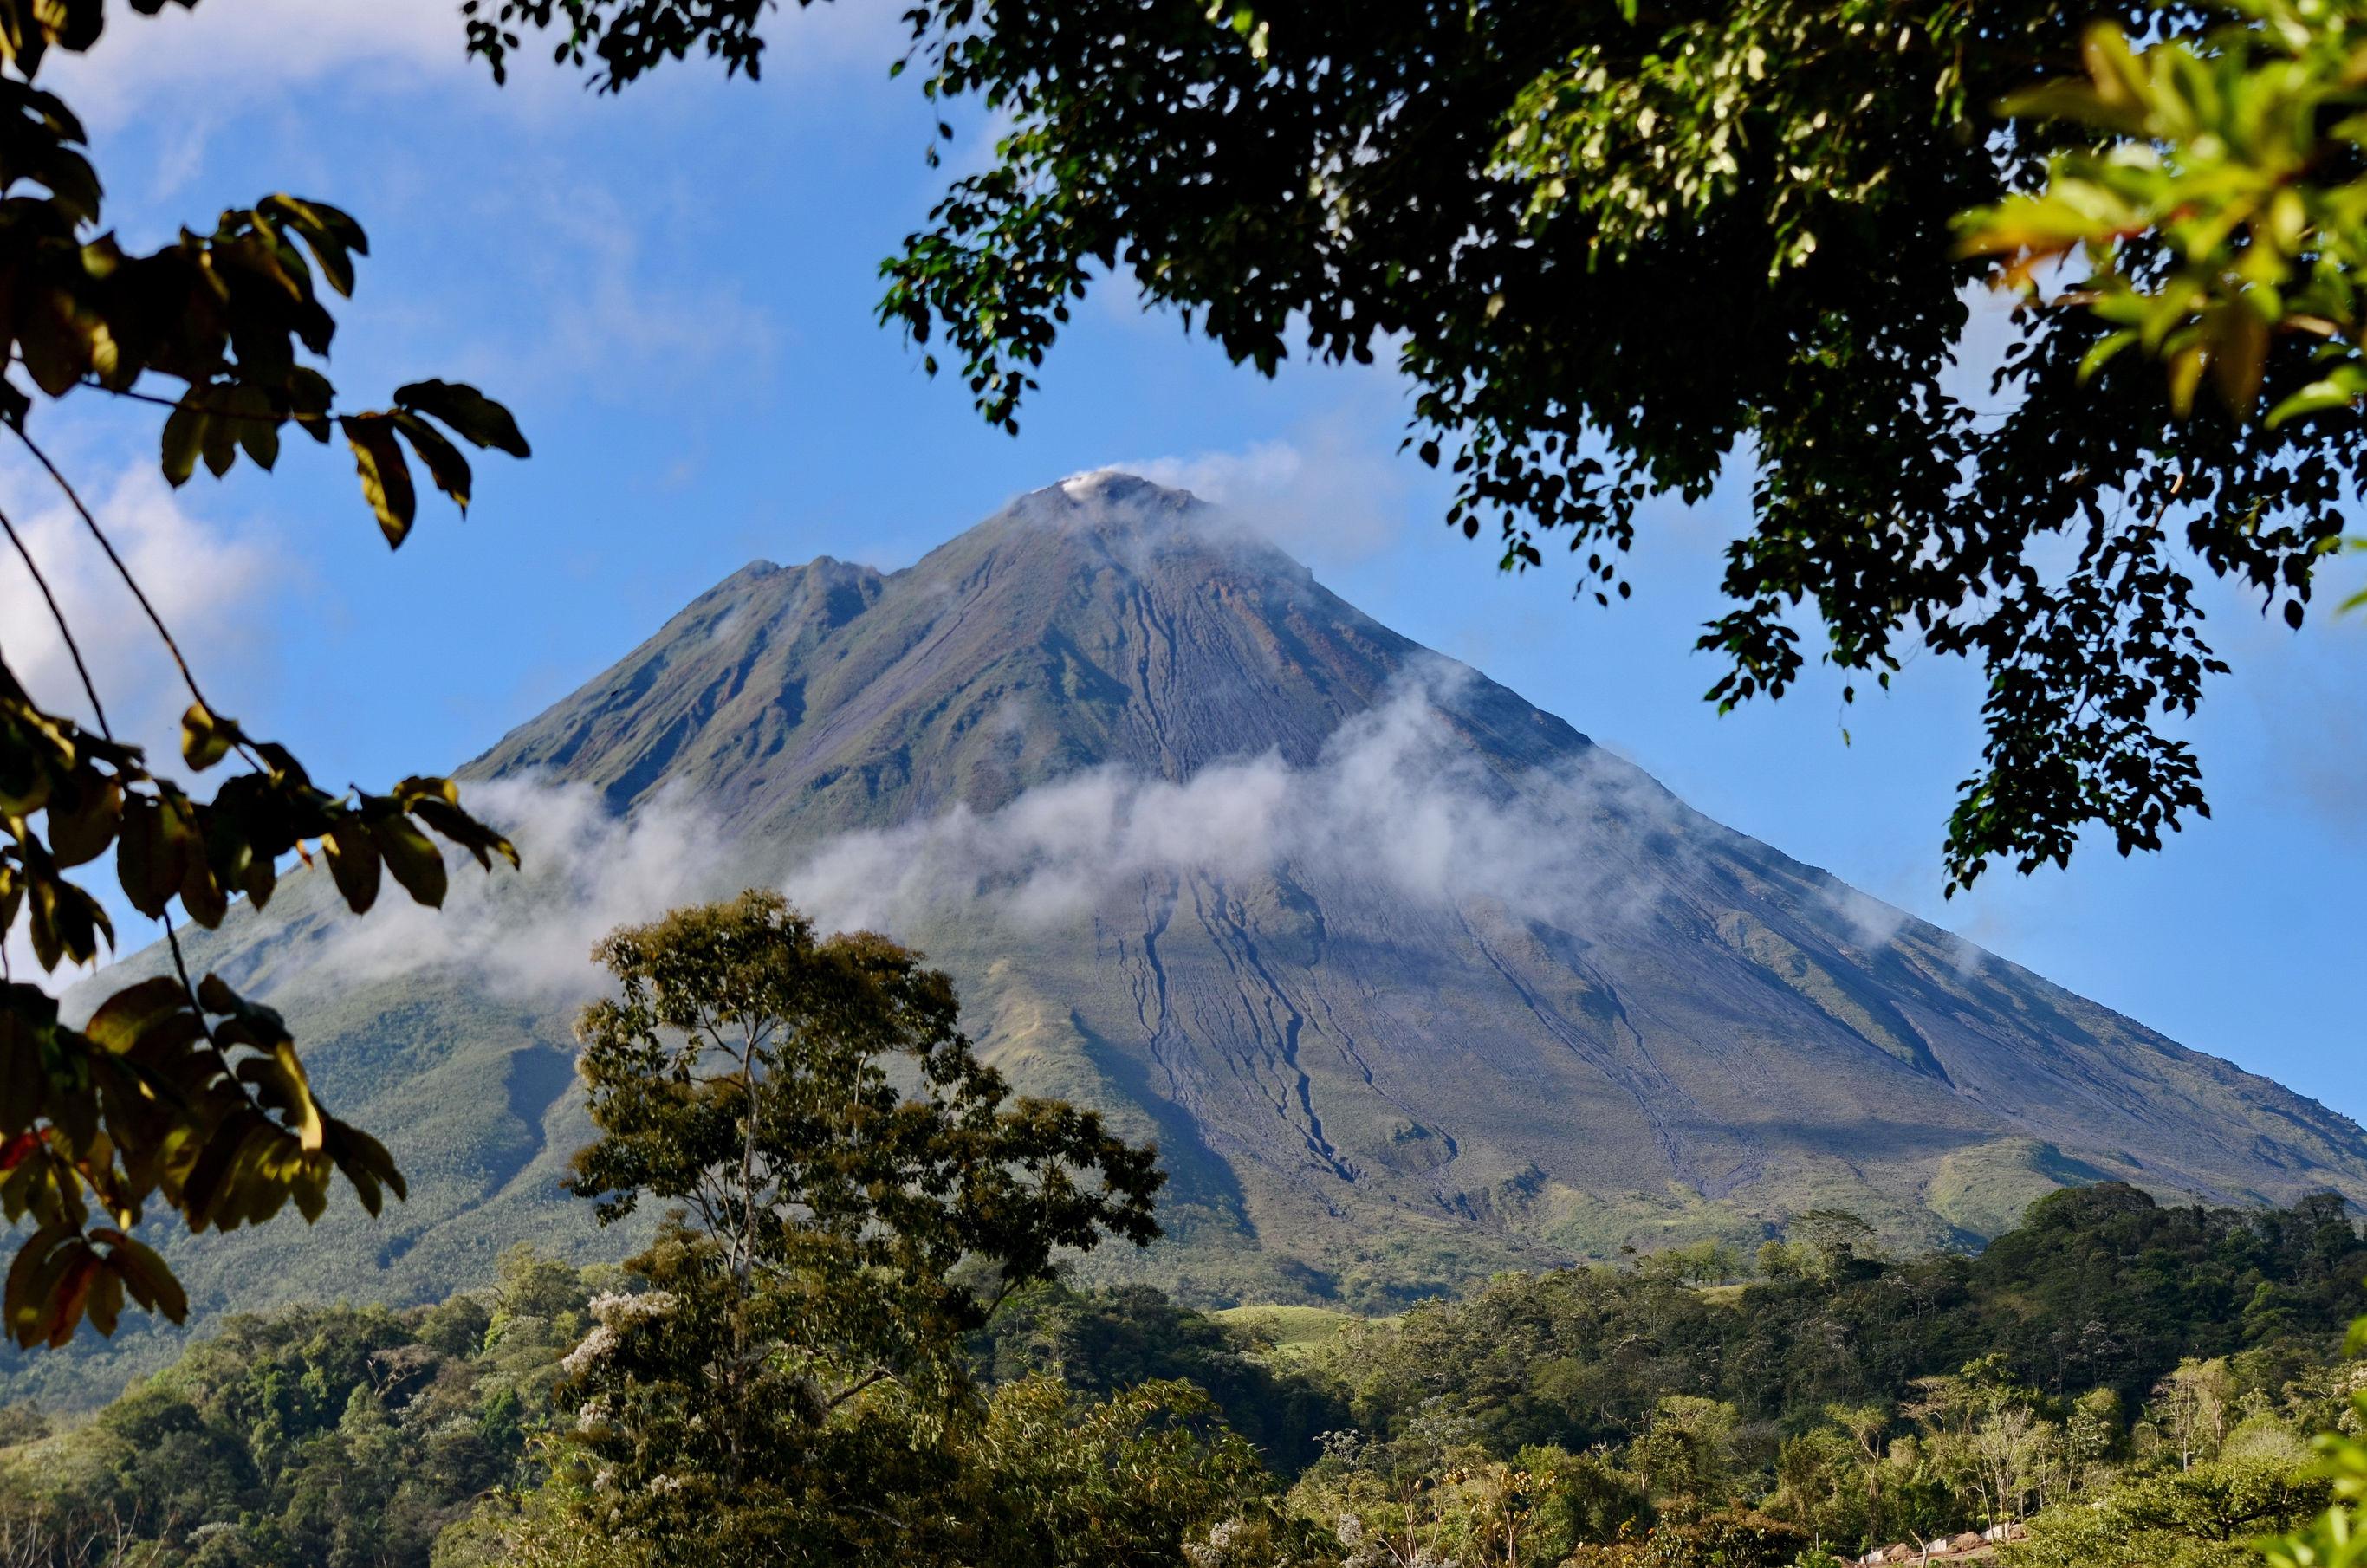 Arenal-Vulkaan-5_3_335645 Toerisme Europa - Toerisme Europa